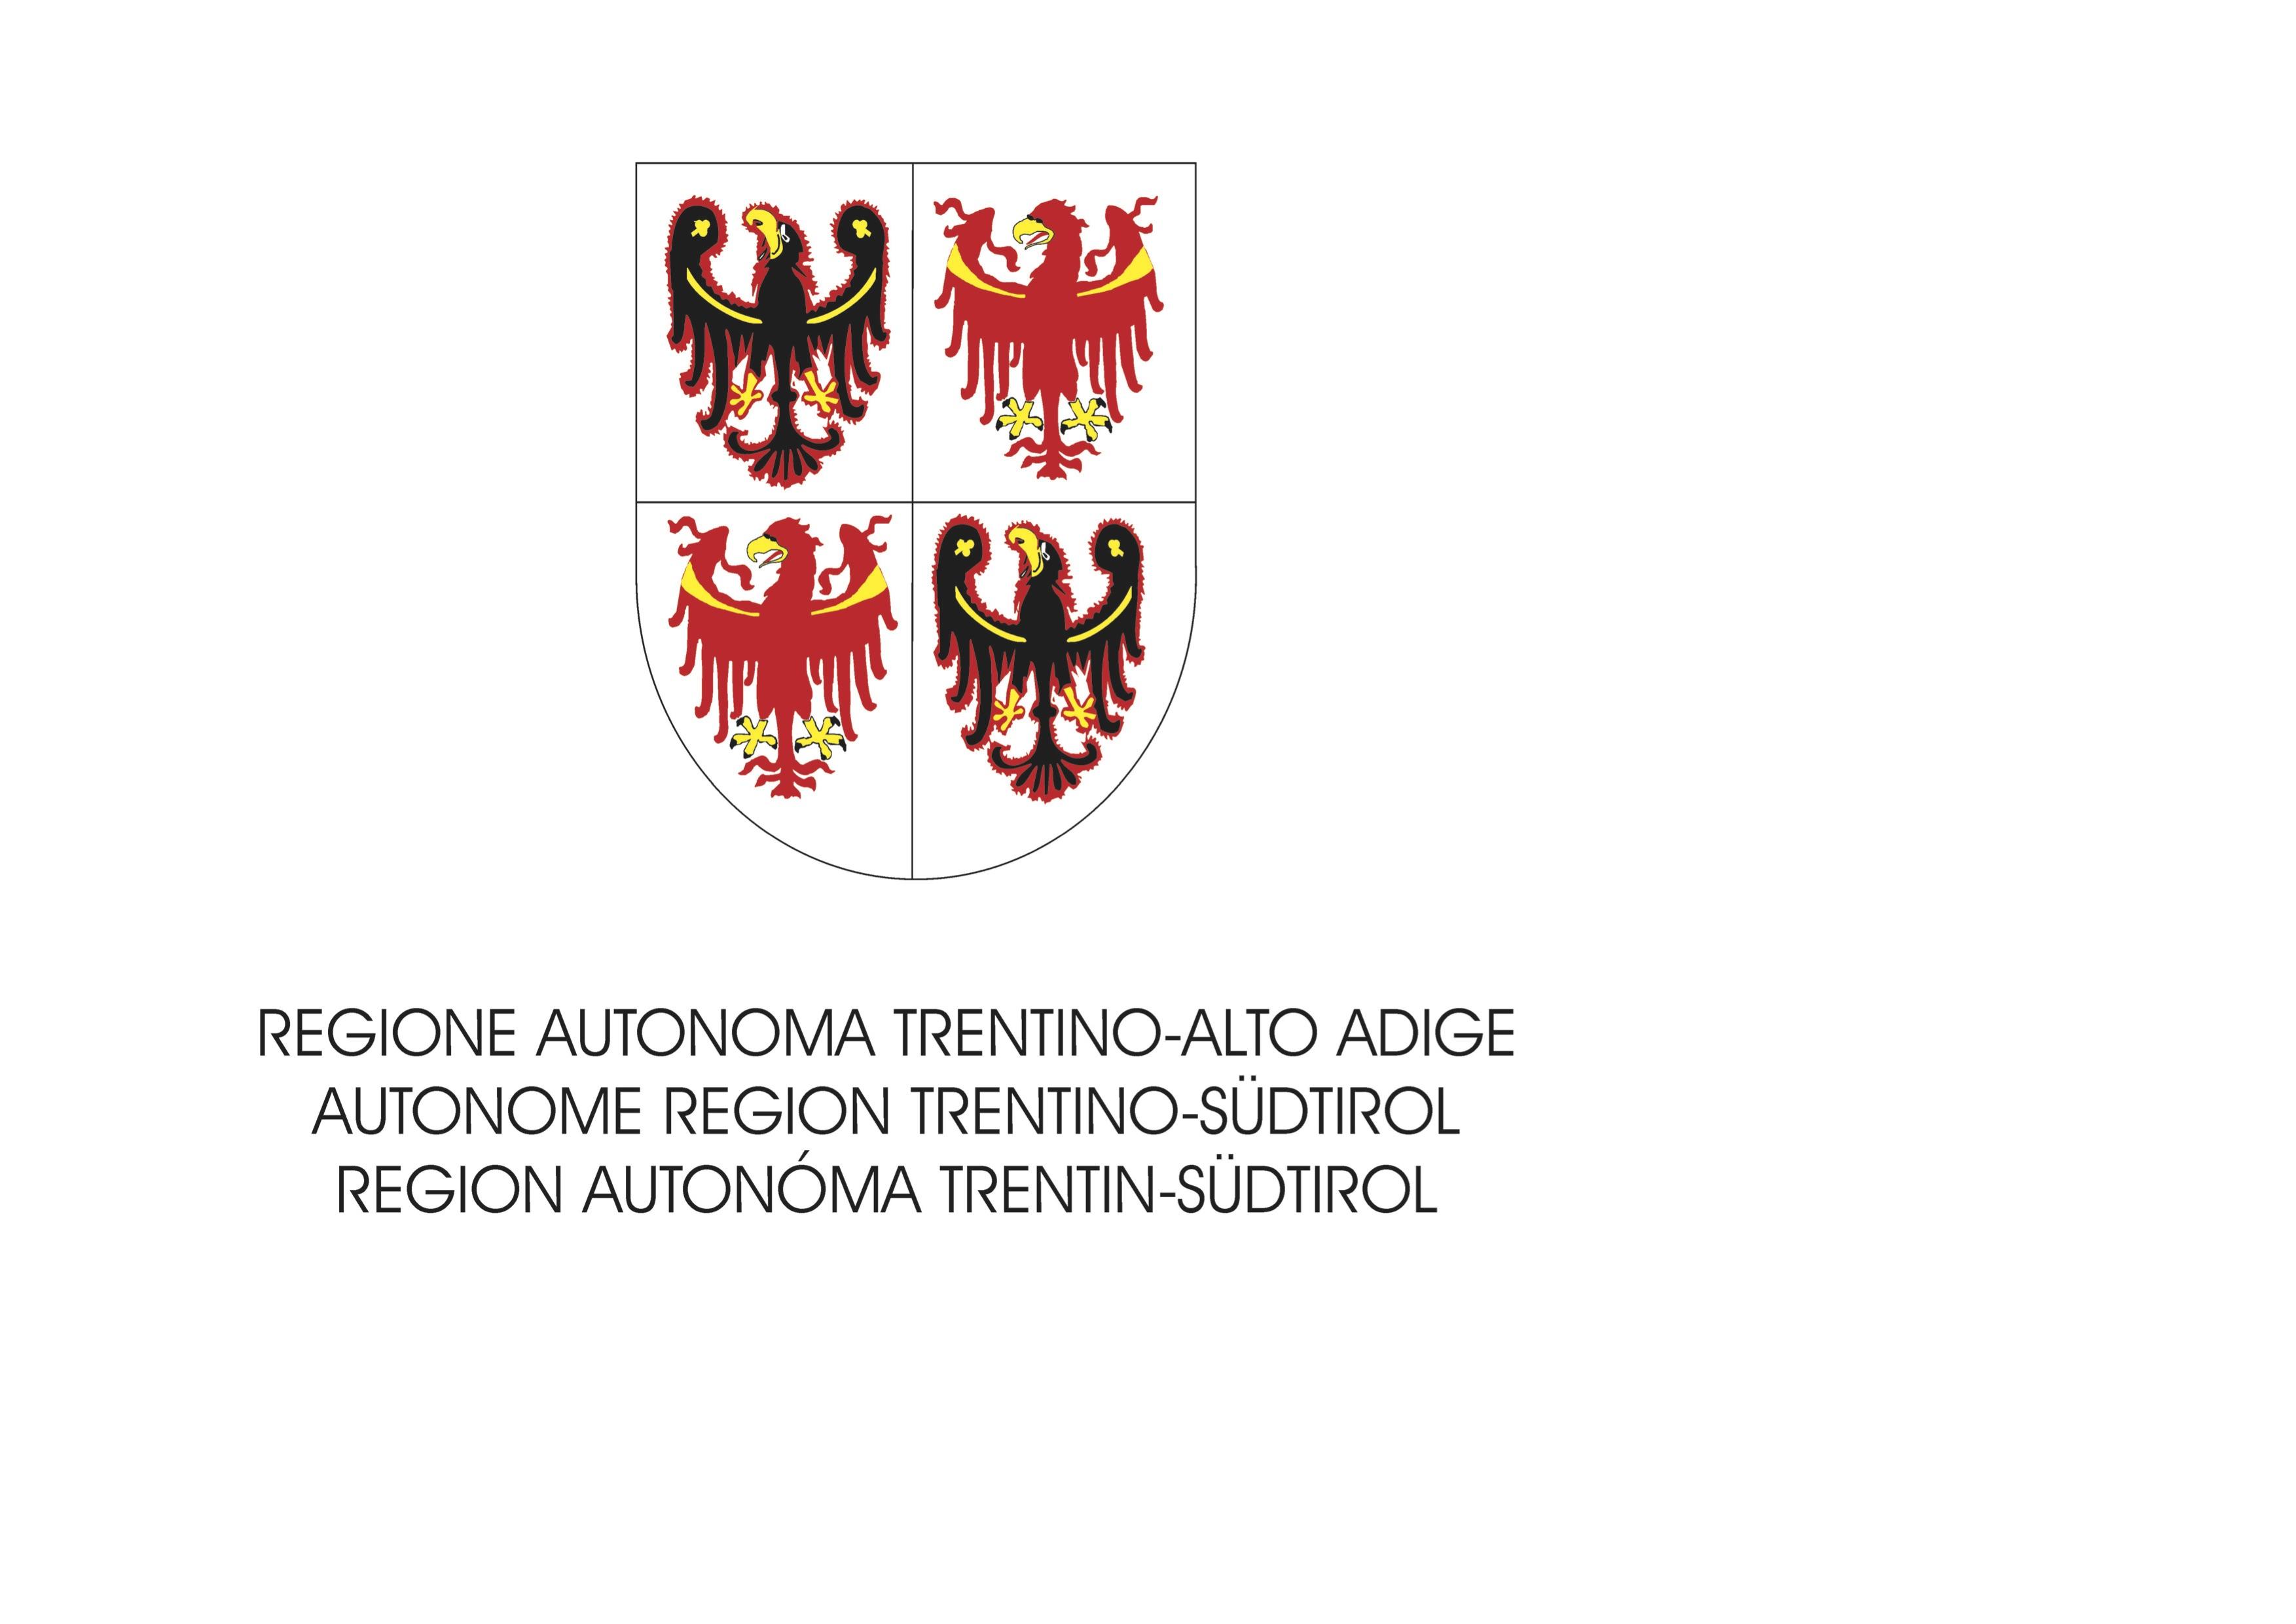 TRENTINO A. ADIGE